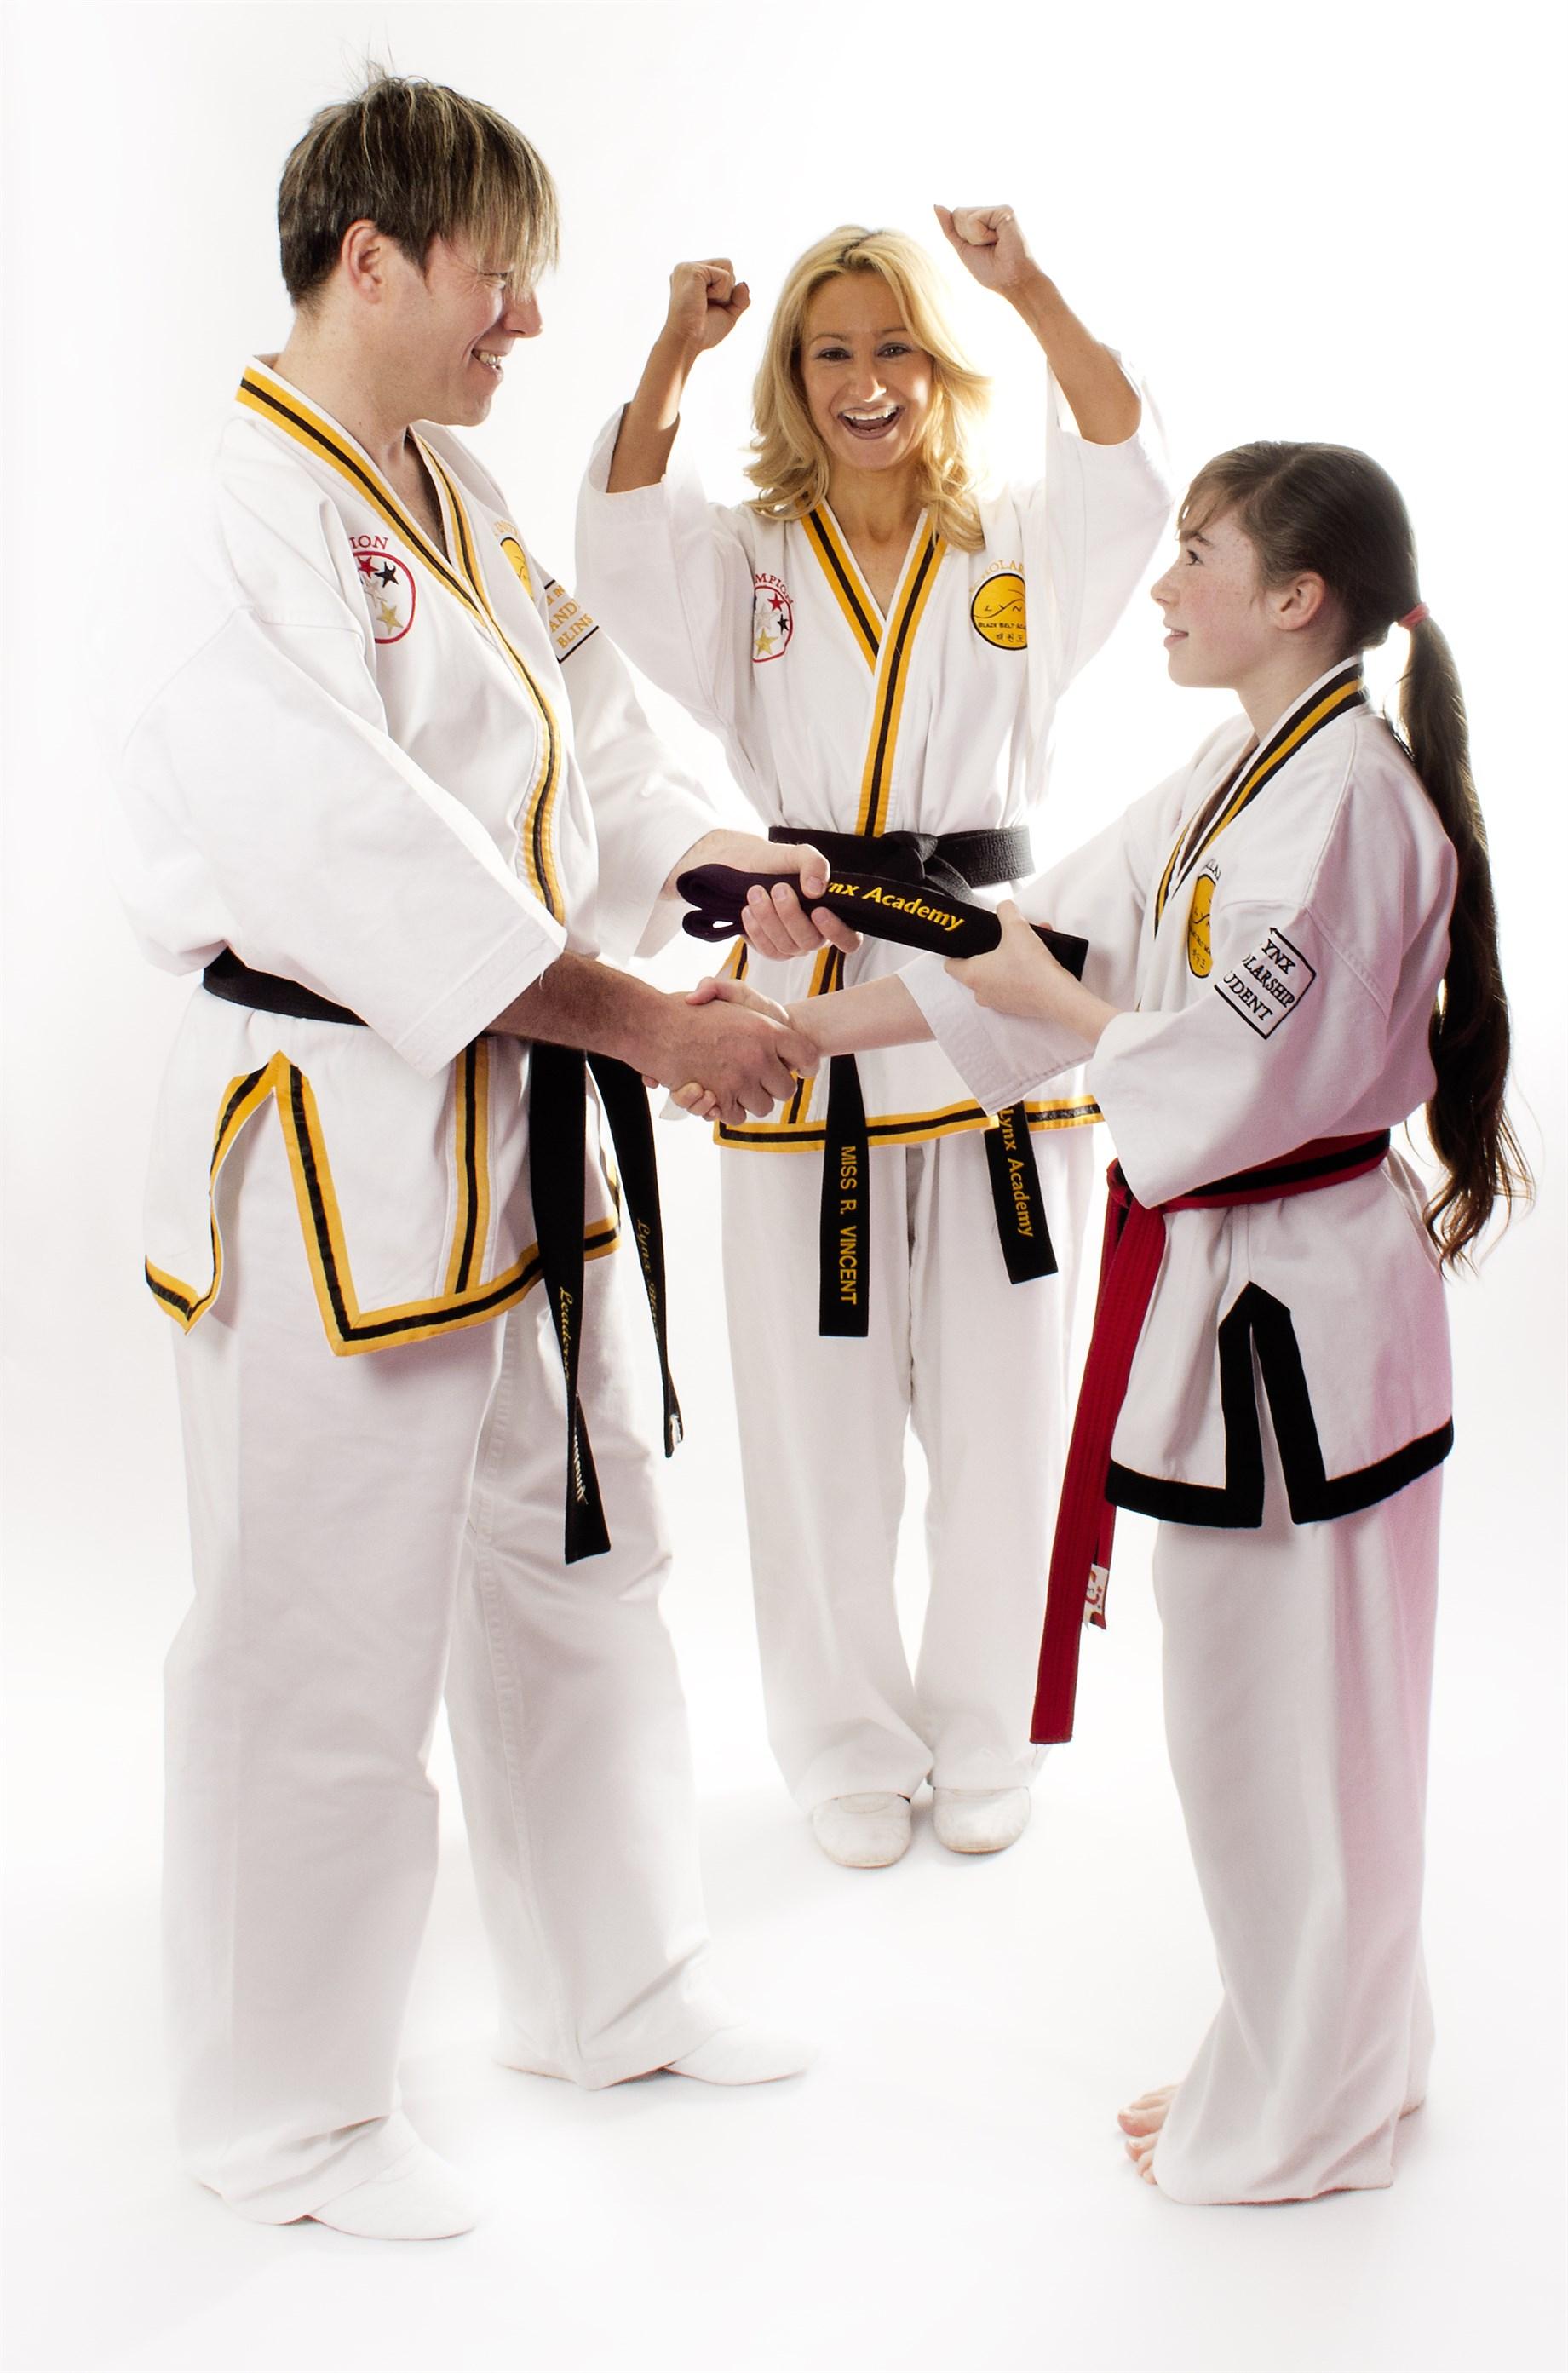 Family Program at Lynx Black Belt Leadership Academy, Retford